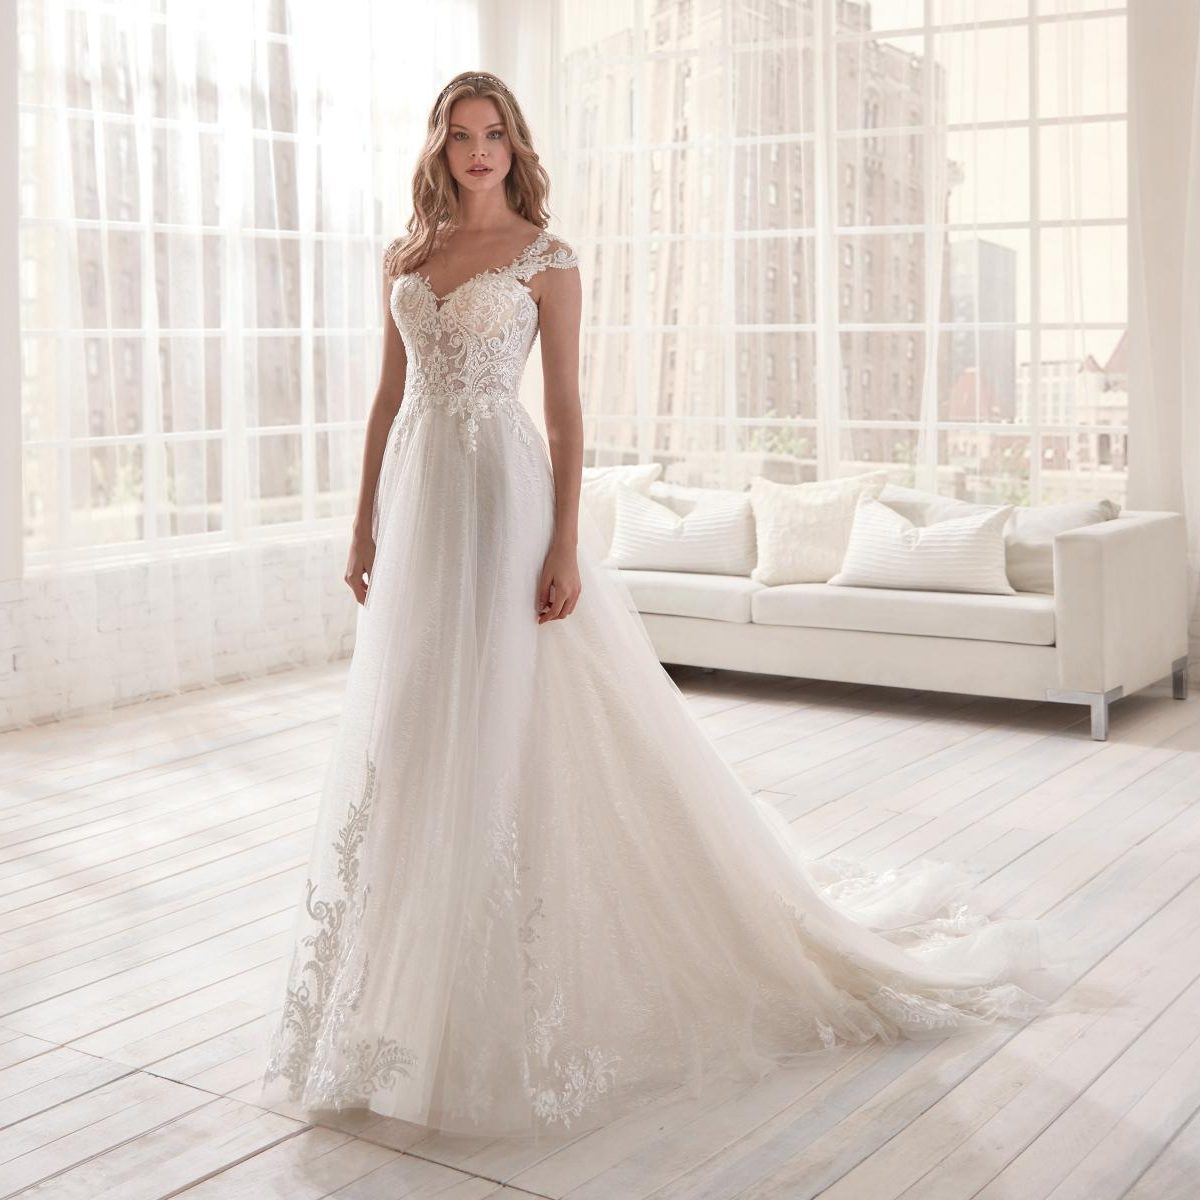 Elizabeth-Bridal-Jolies-20691